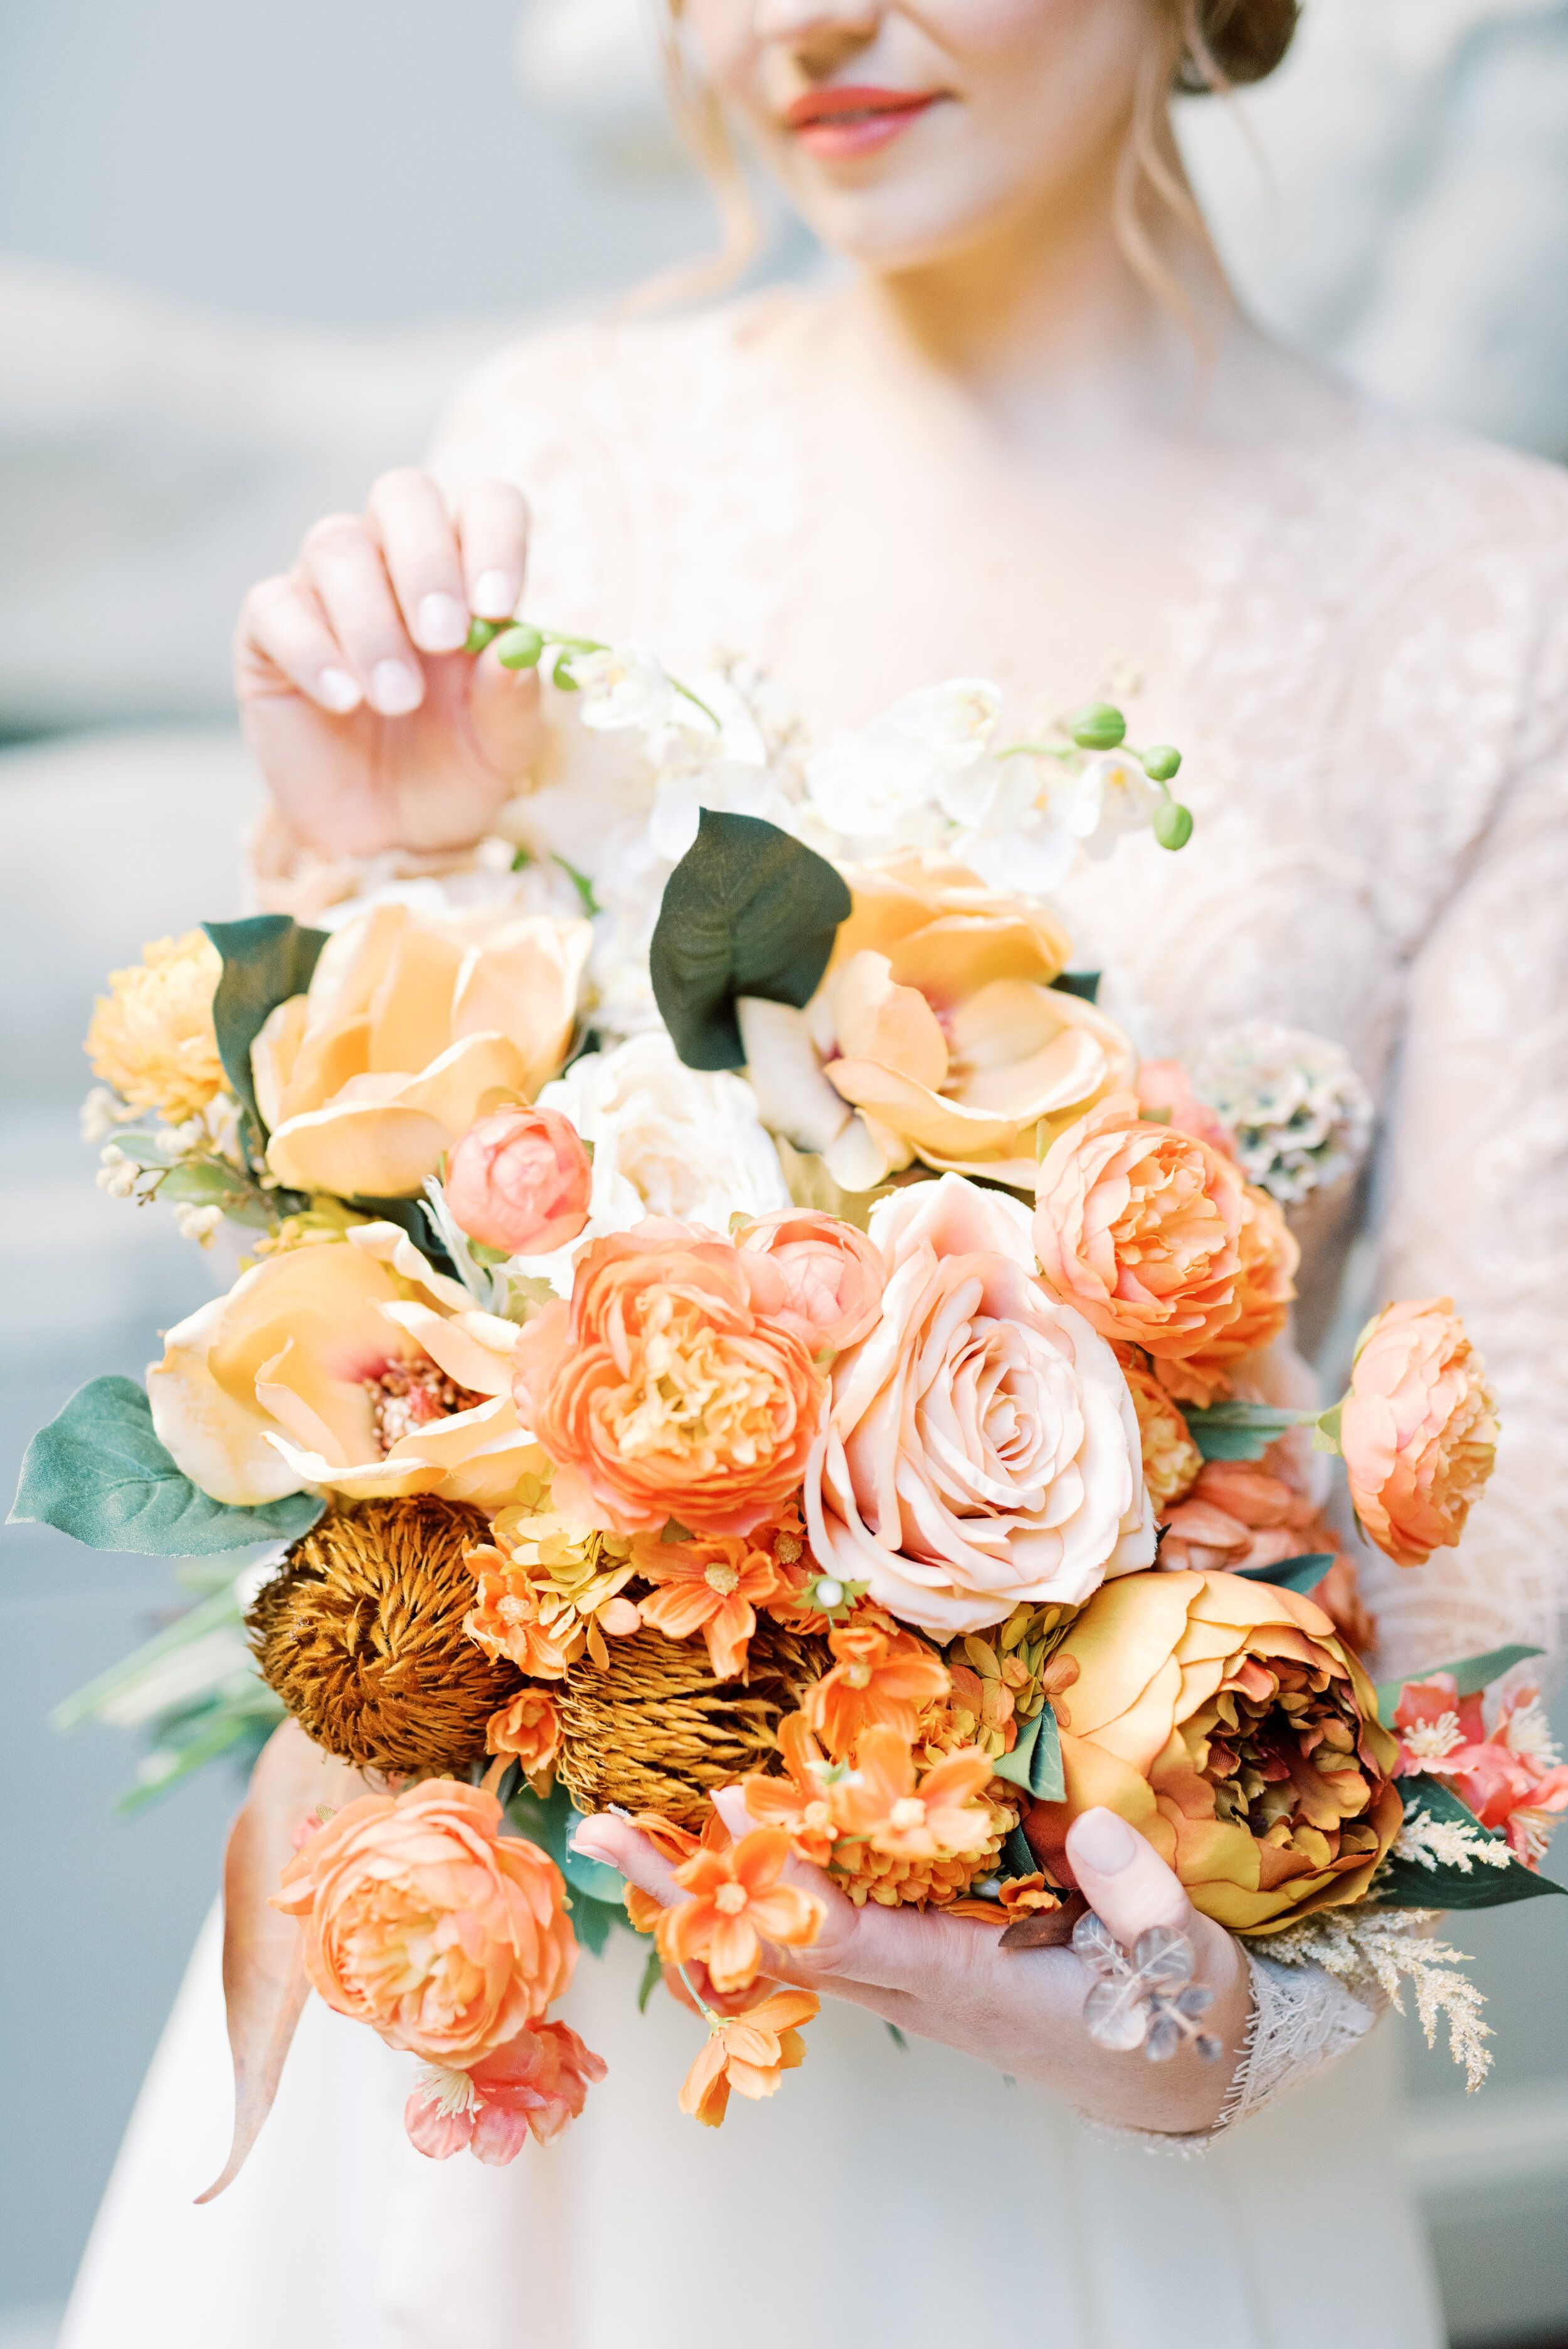 Pennsylvania Academy of Fine Art Wedding Inspiration in